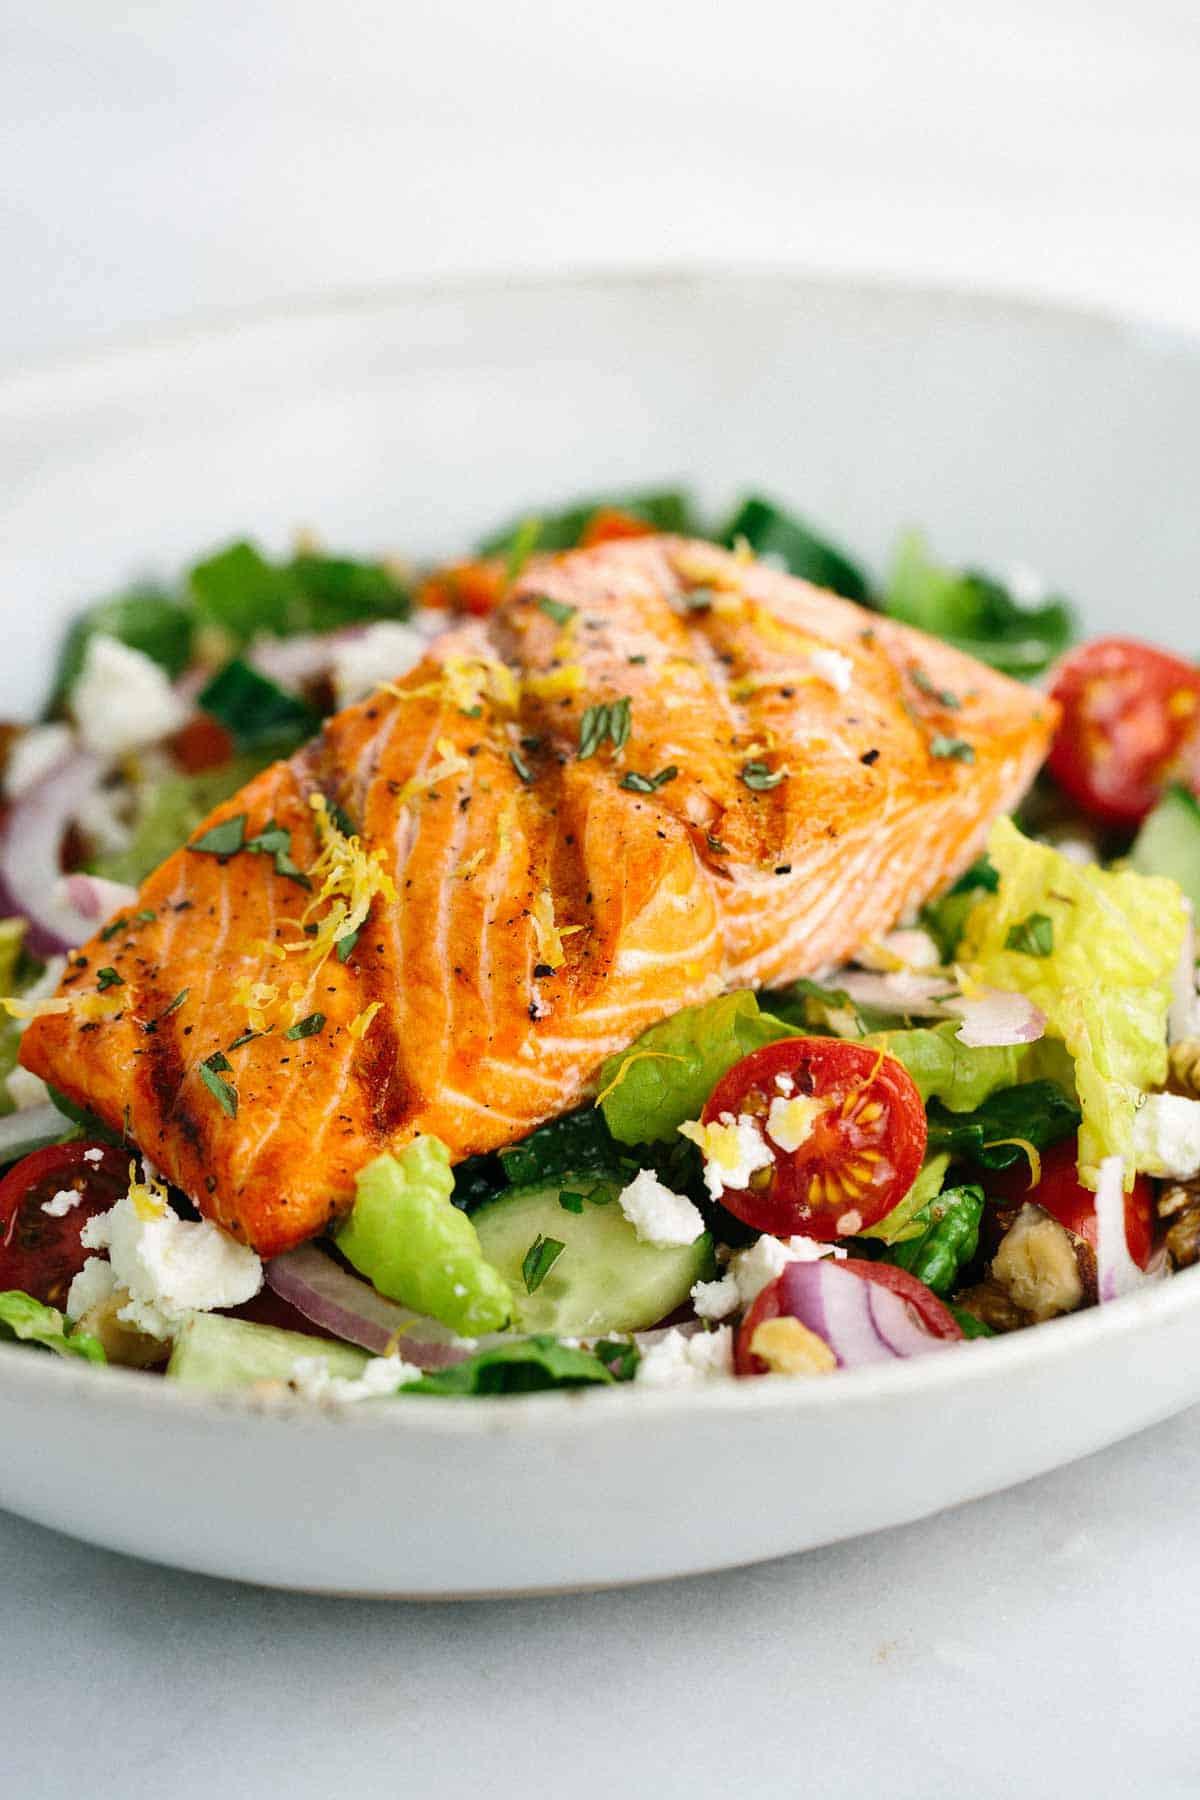 Salmon Salad Recipe  Grilled Salmon Greek Salad with Lemon Basil Dressing